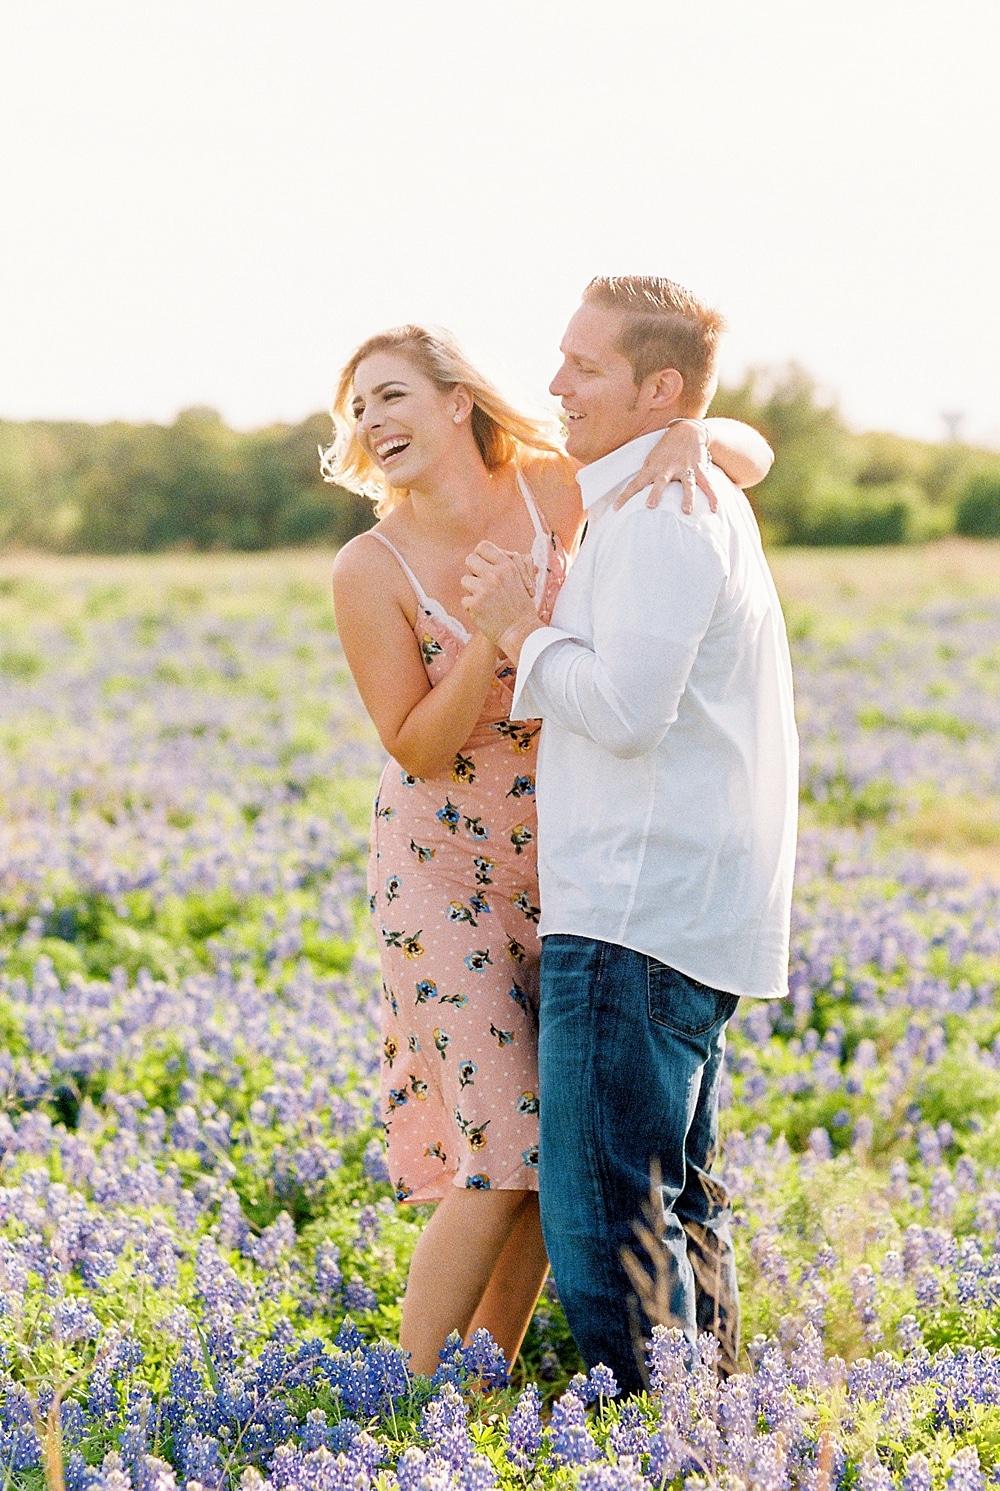 Kristin-La-Voie-Photography-Austin-Texas-Wedding-Photographer-26